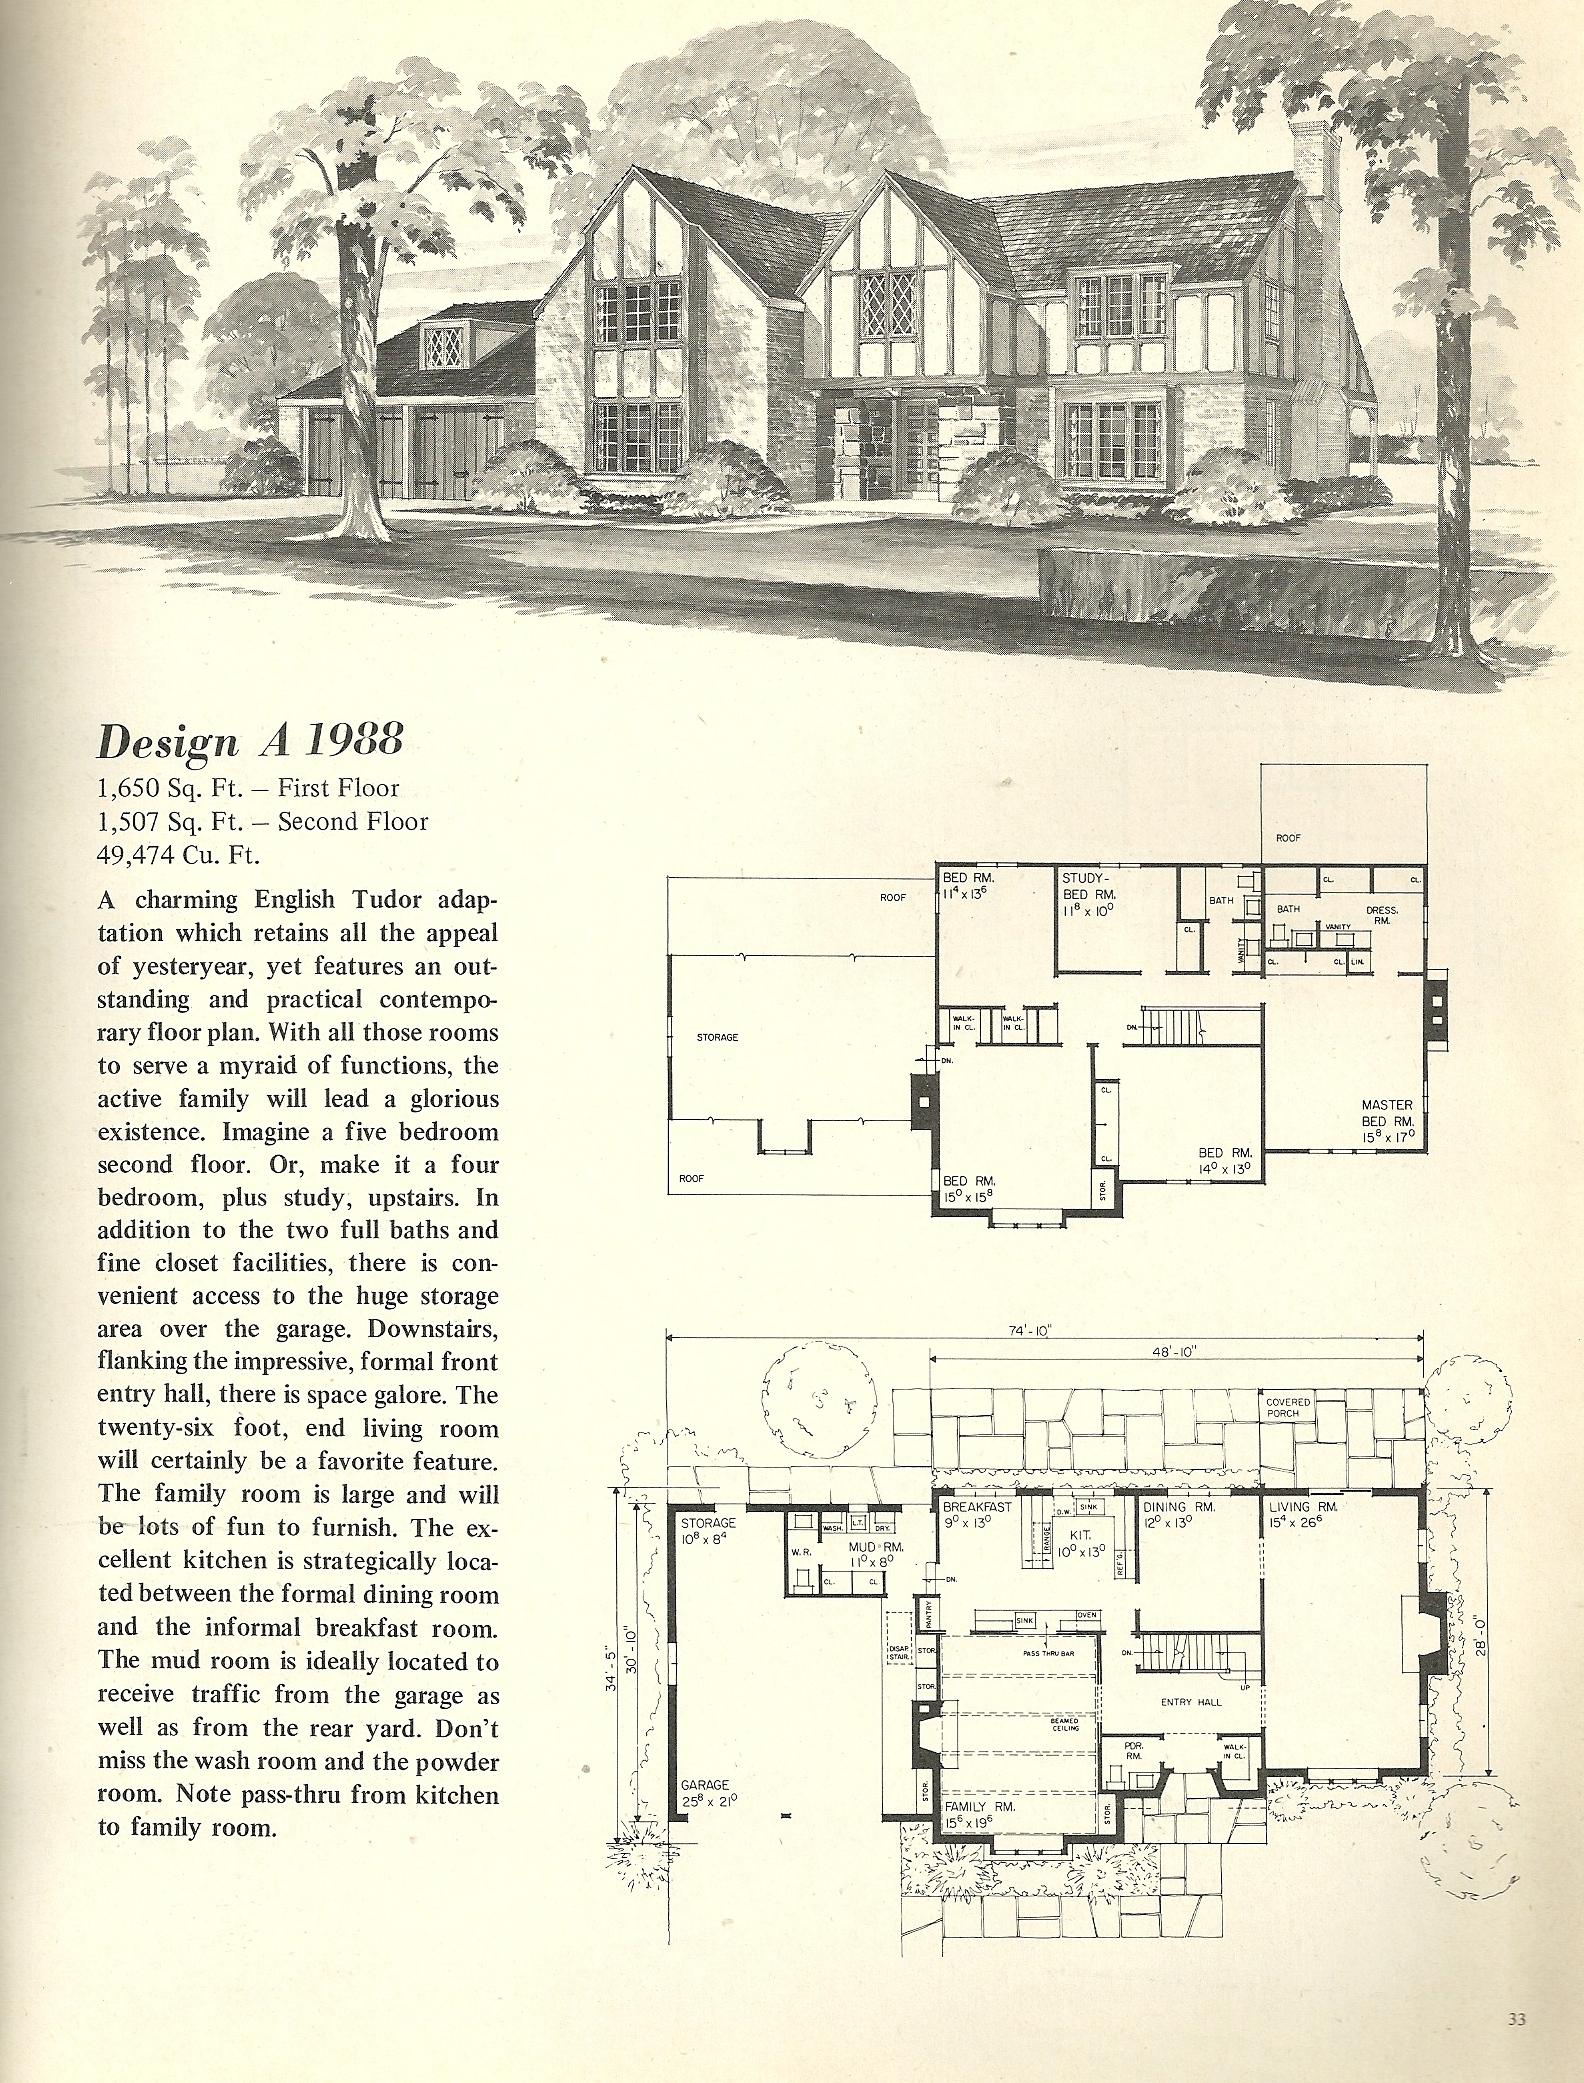 Vintage house plans 1988 antique alter ego for Tudor home floor plans